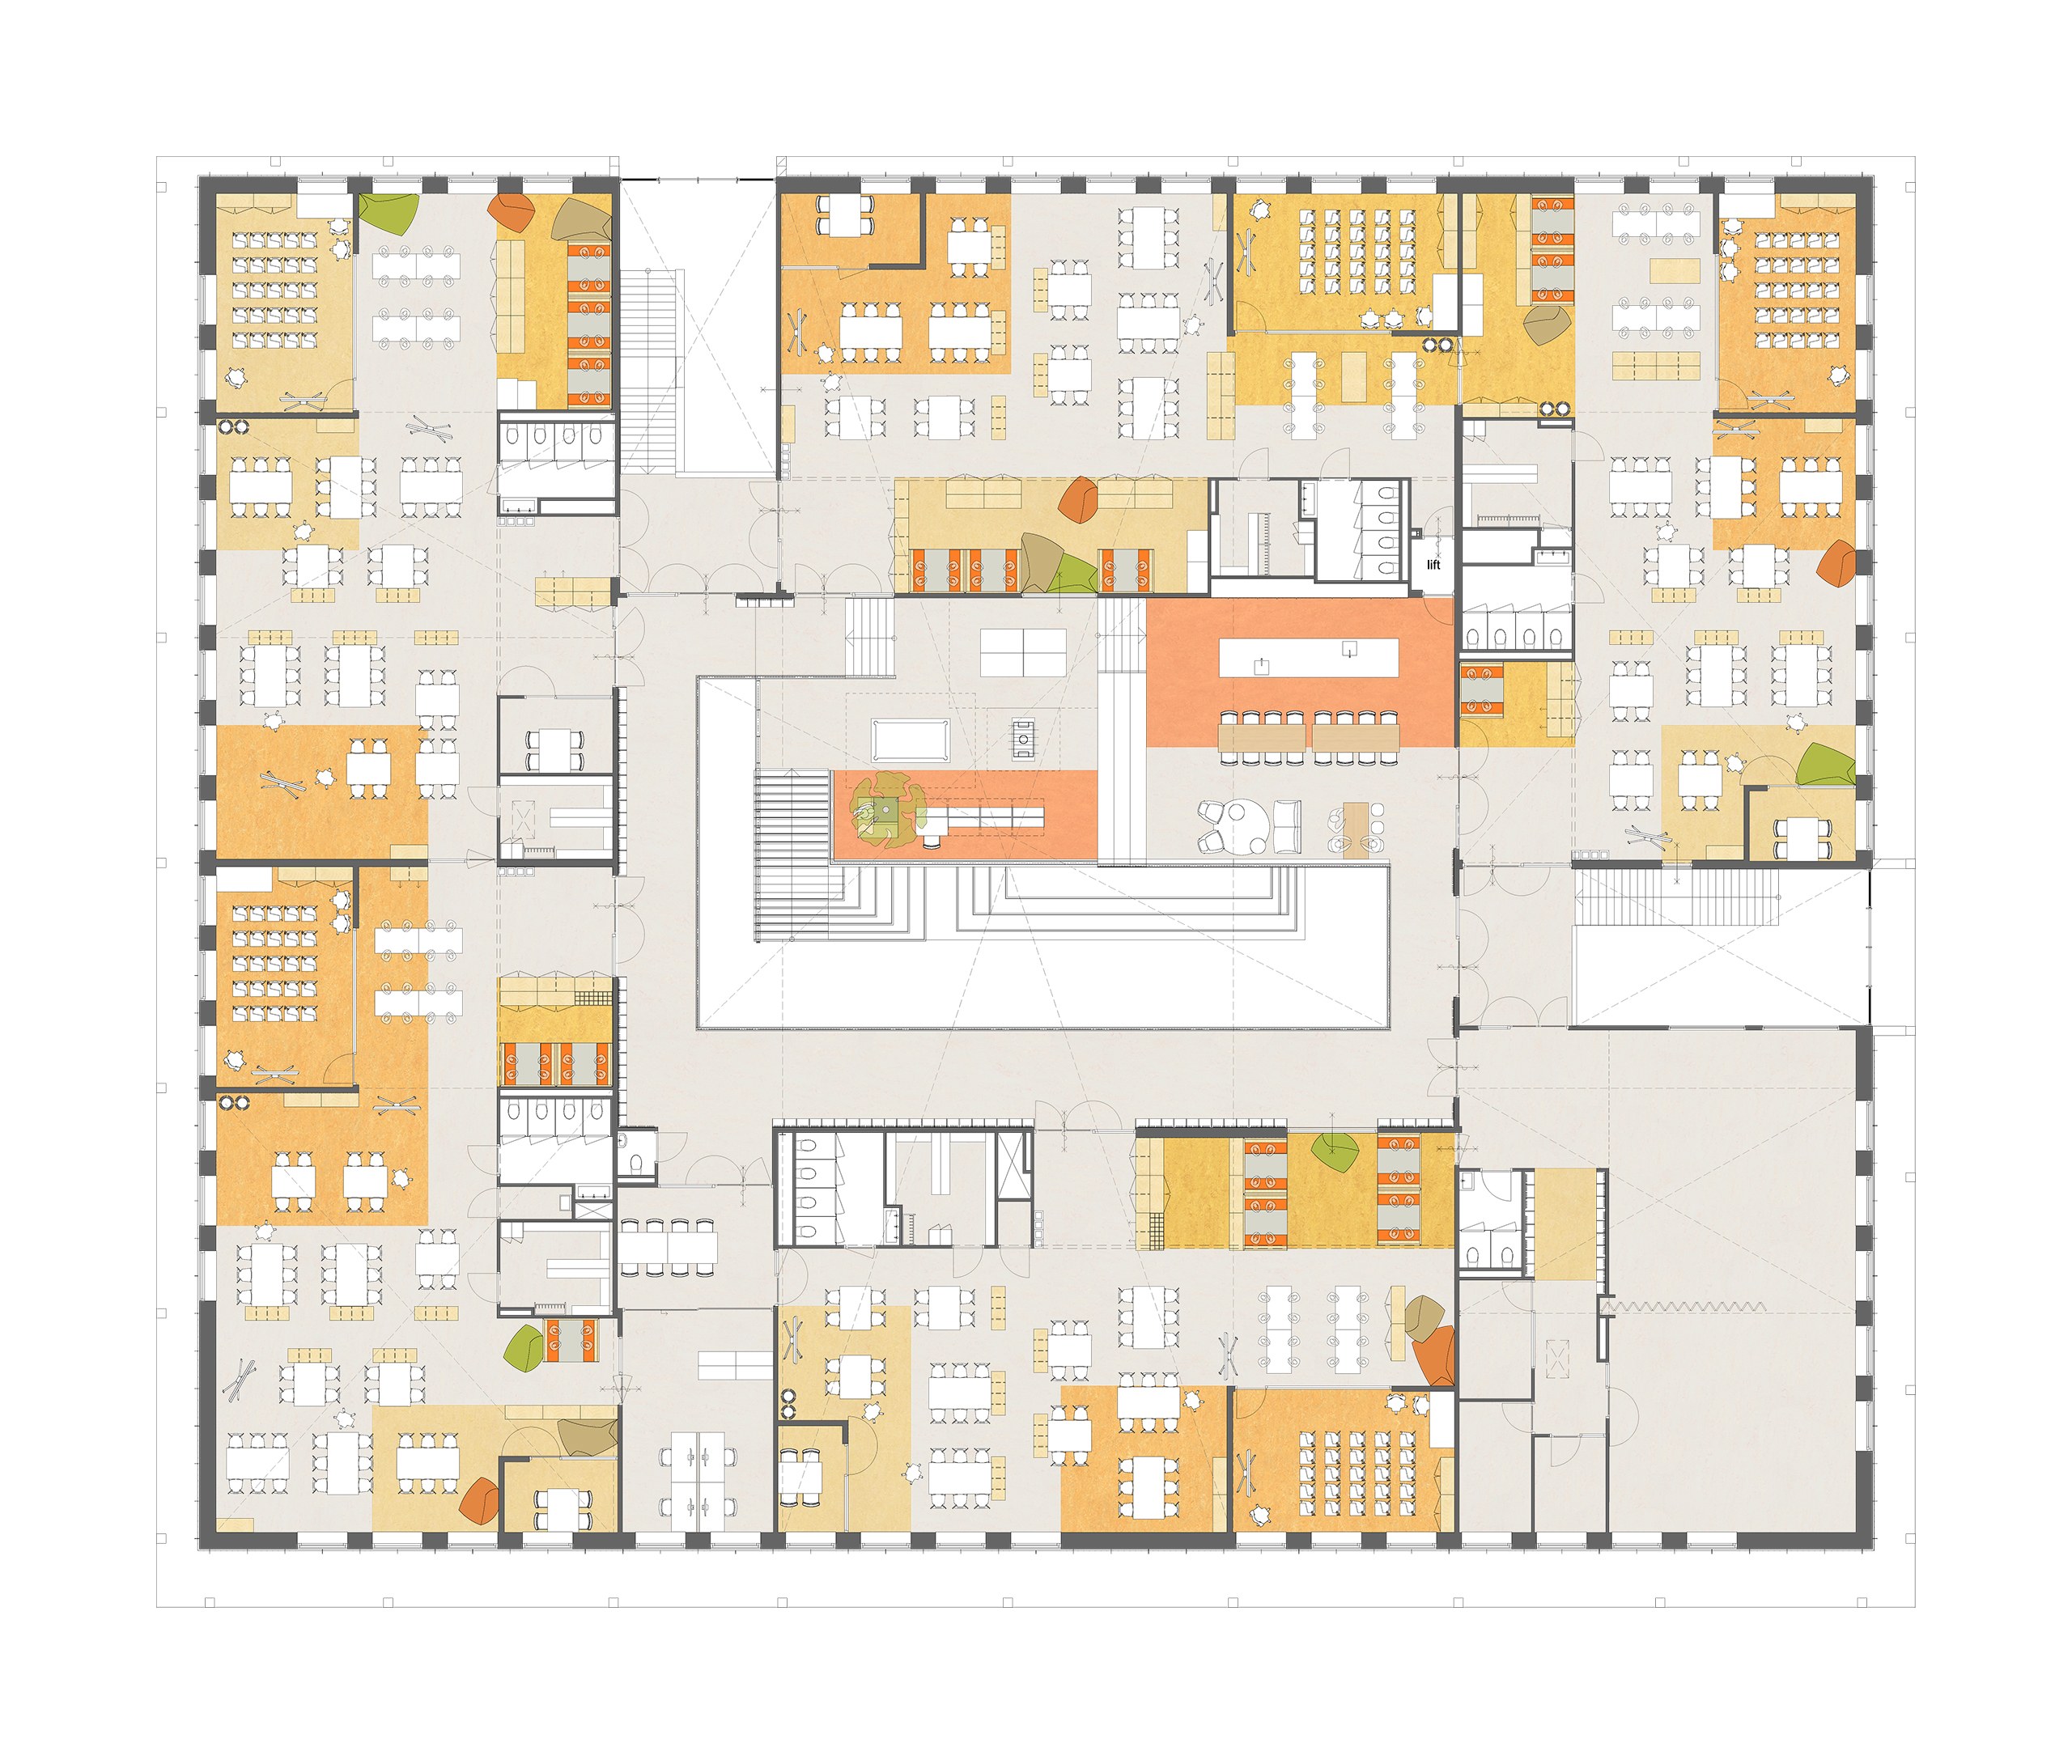 StM-AMA-Kindcentrum-De-Samenstroom-plattegrond-1e-verdieping